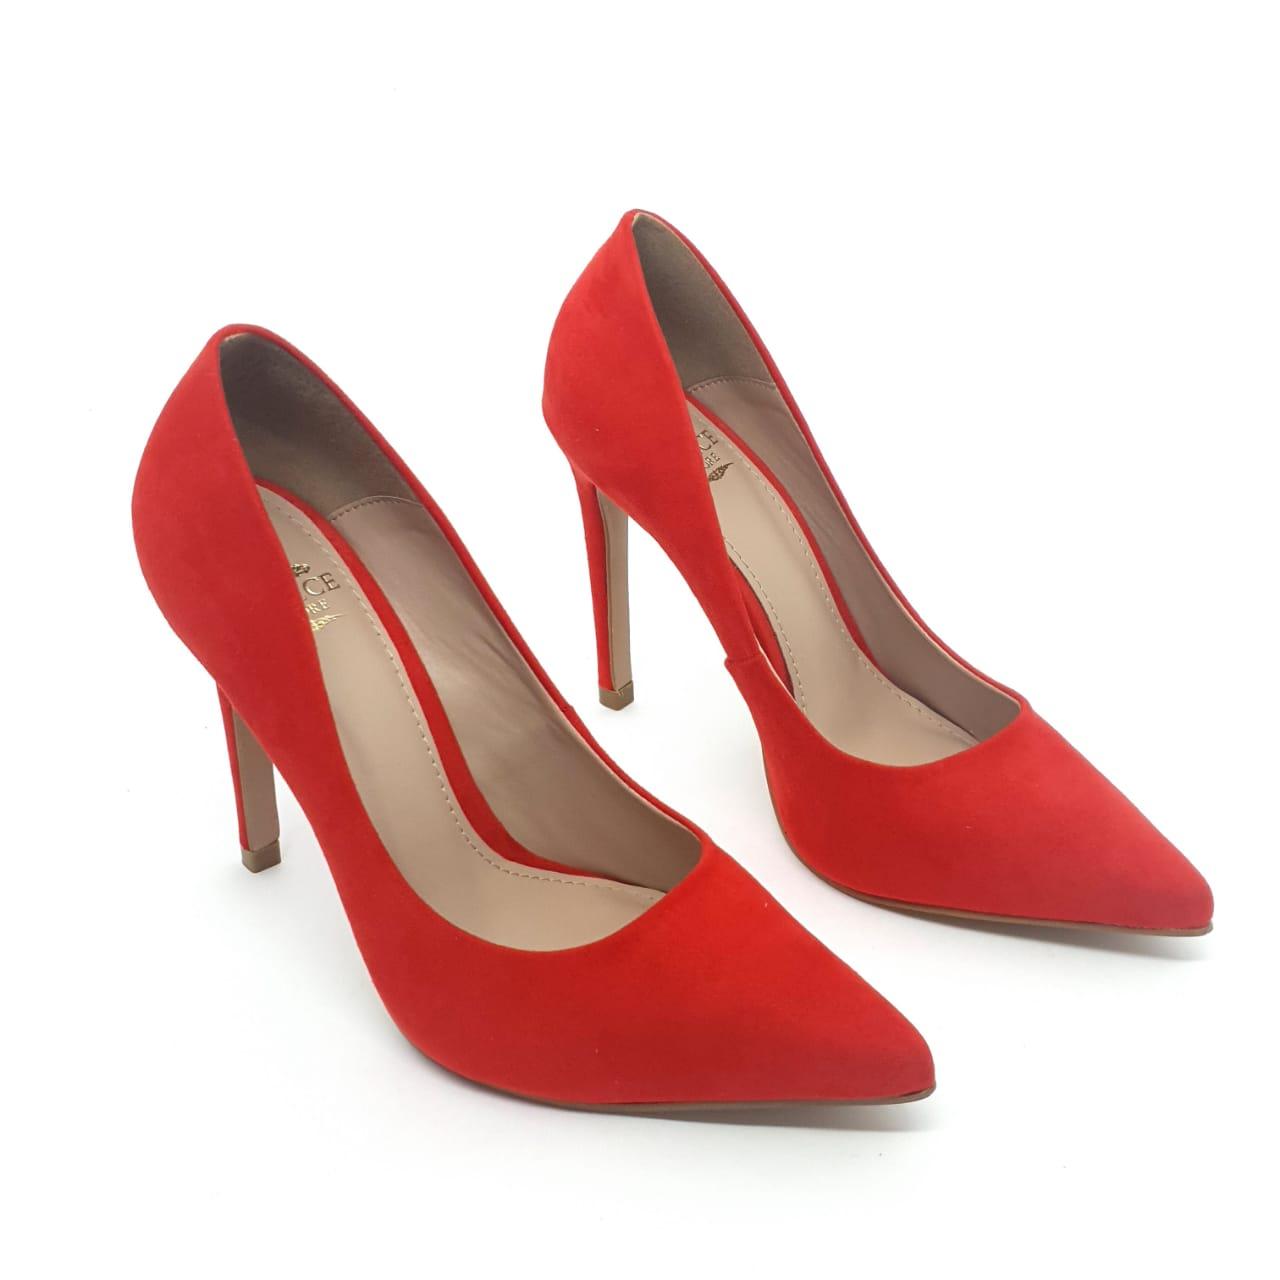 Sapato scarpin vermelho